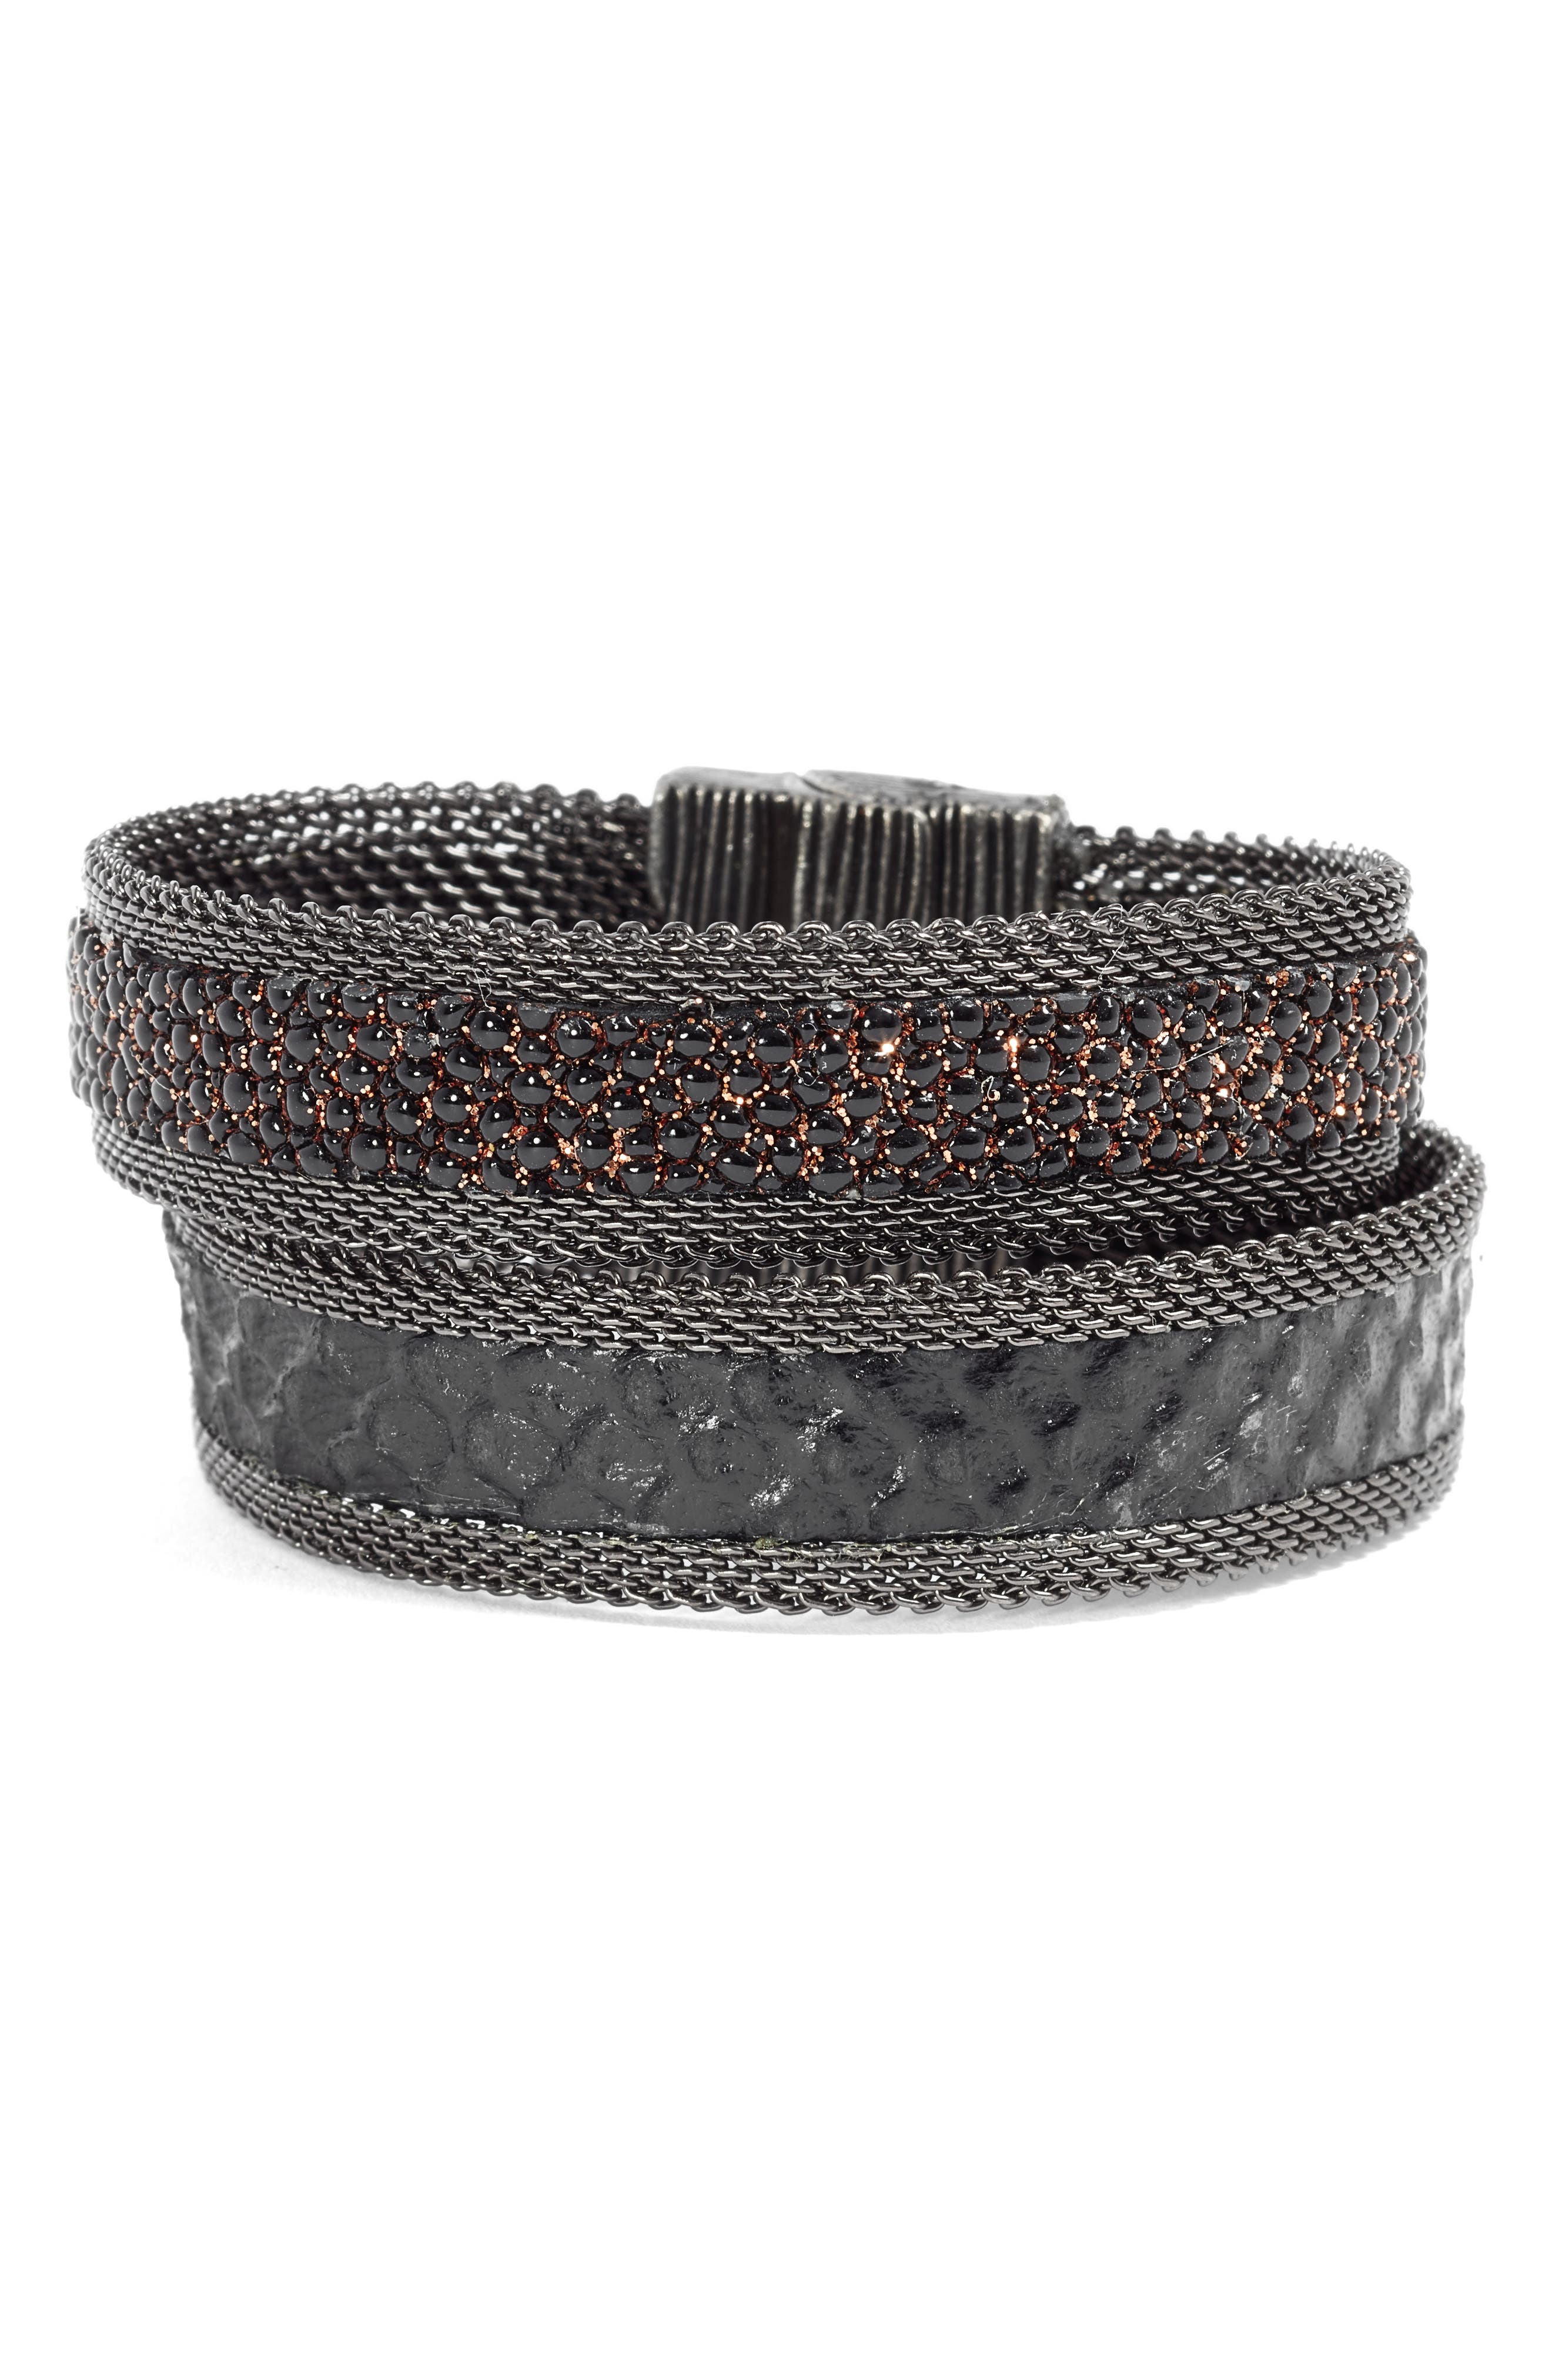 Shimmer Stingray & Snakeskin Bracelet,                         Main,                         color, Black/ Copper/ Gun Metal